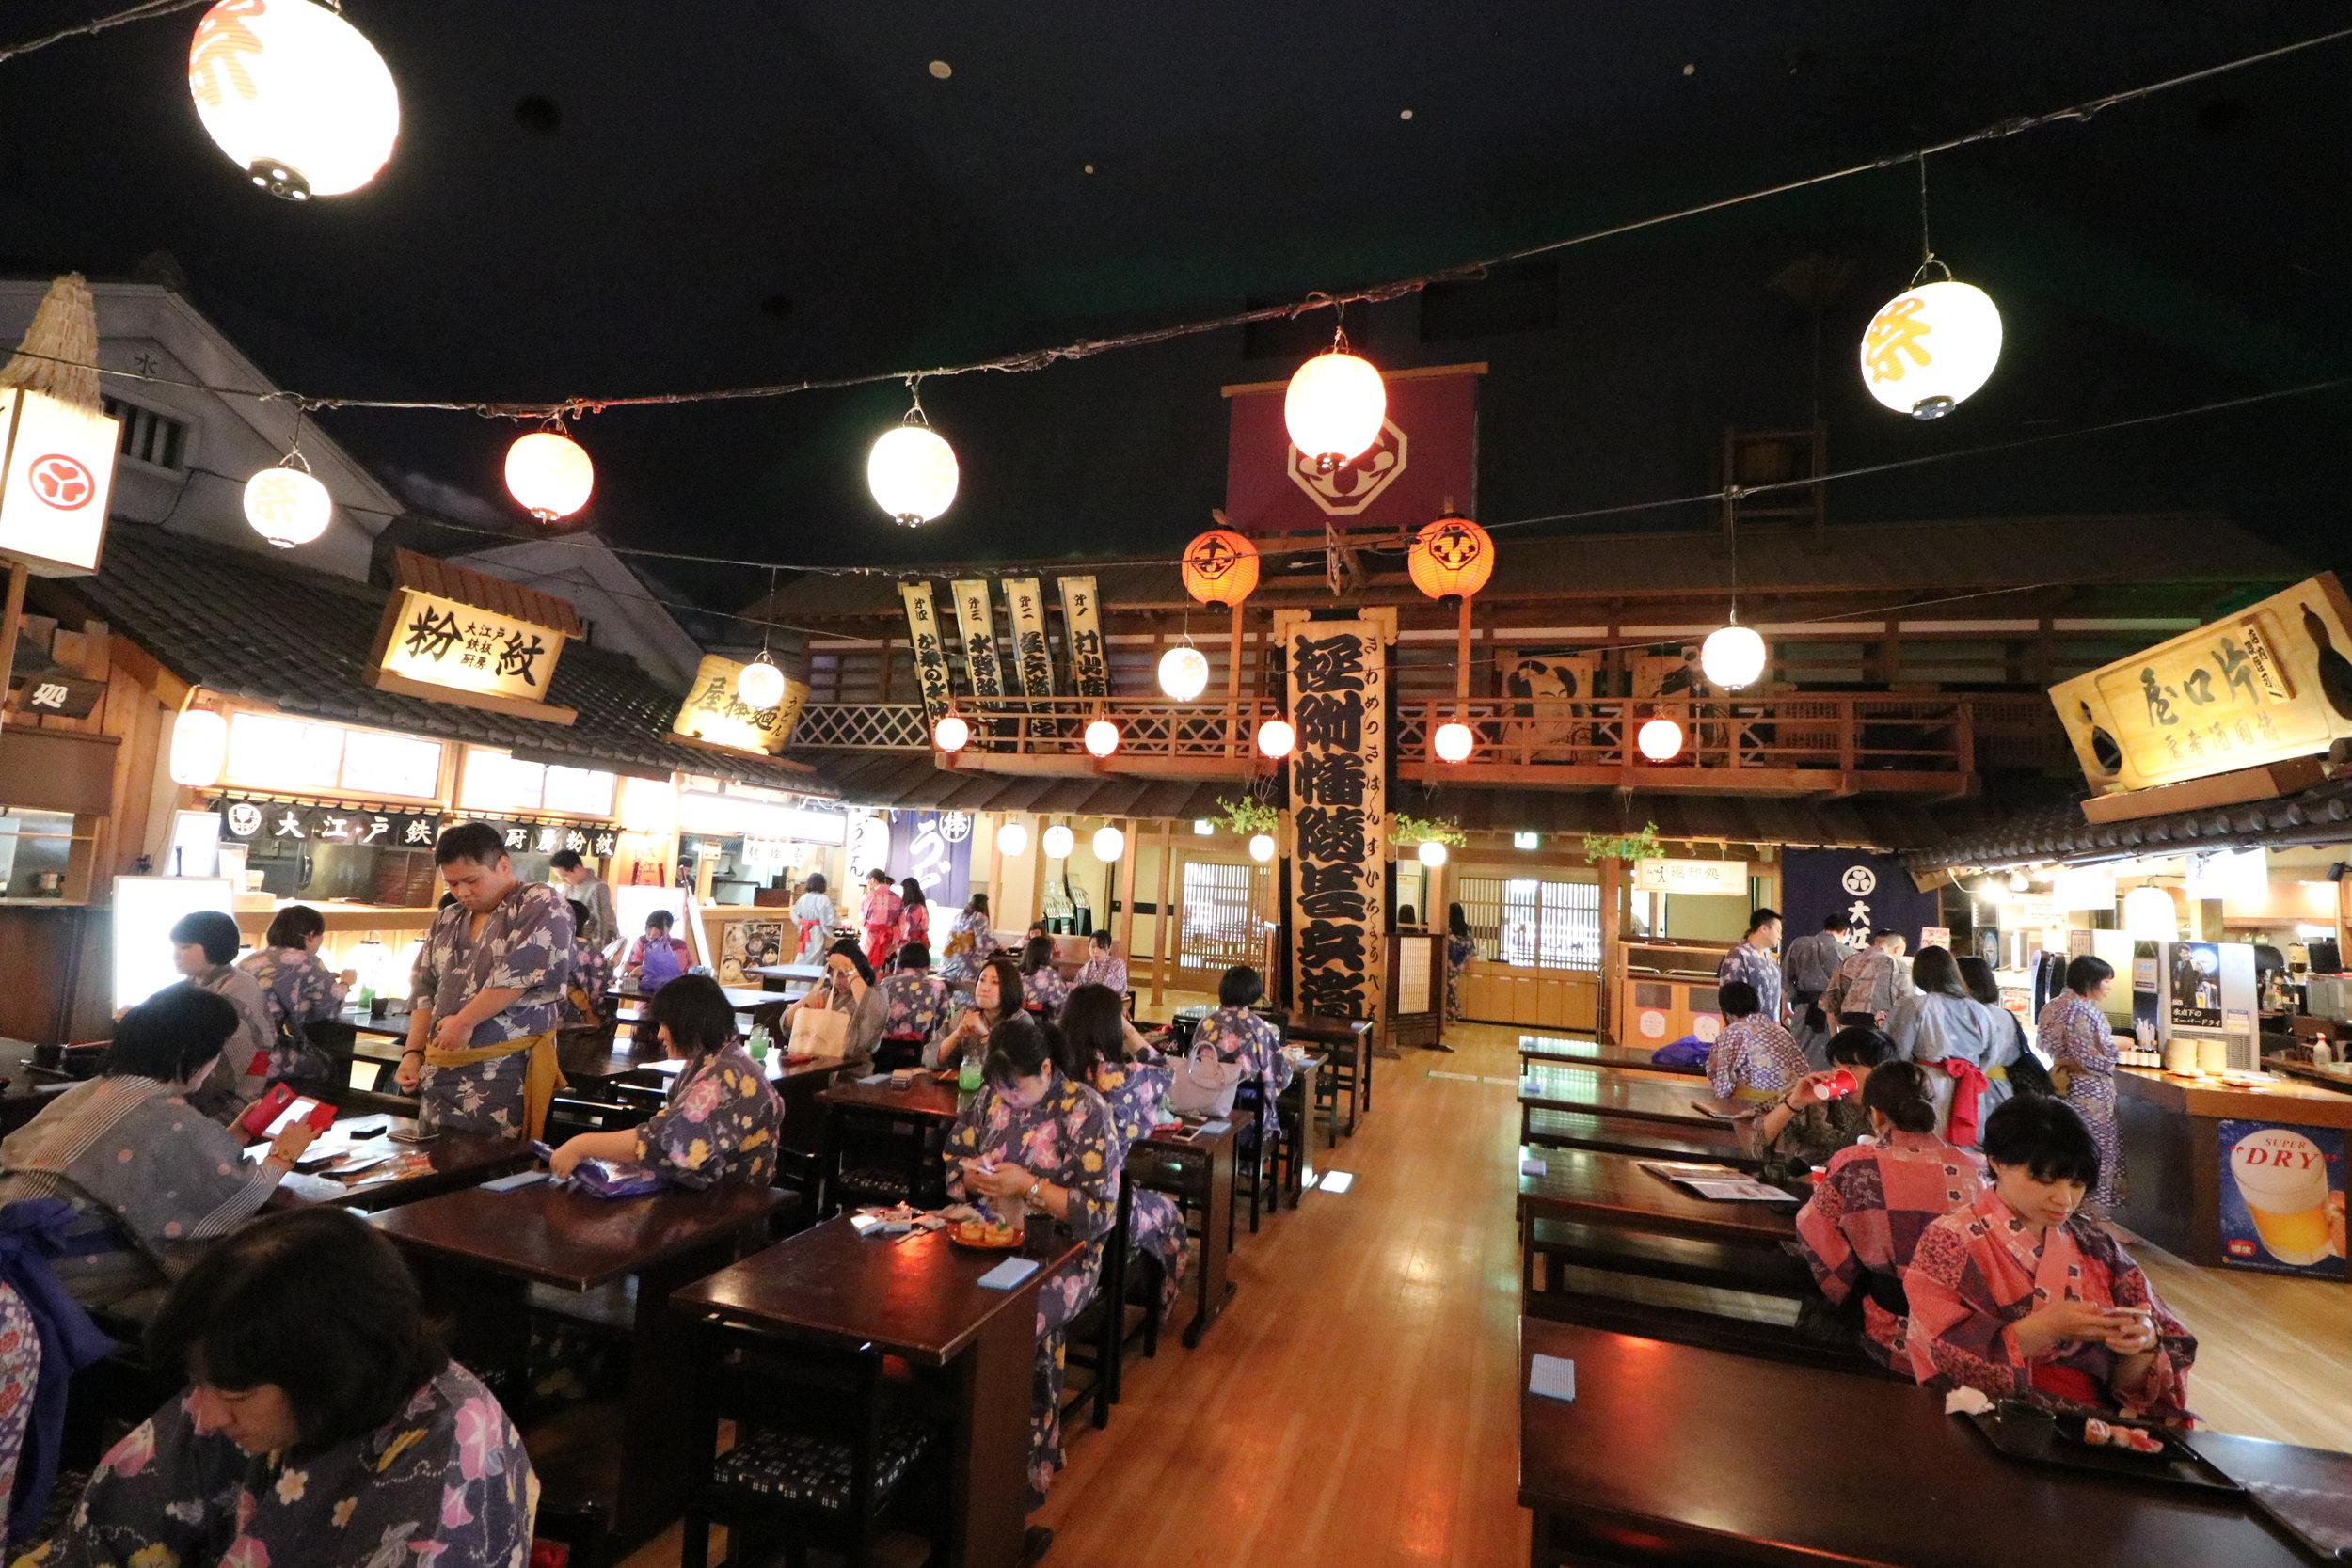 10 things to do in Odaiba ooedo onsen